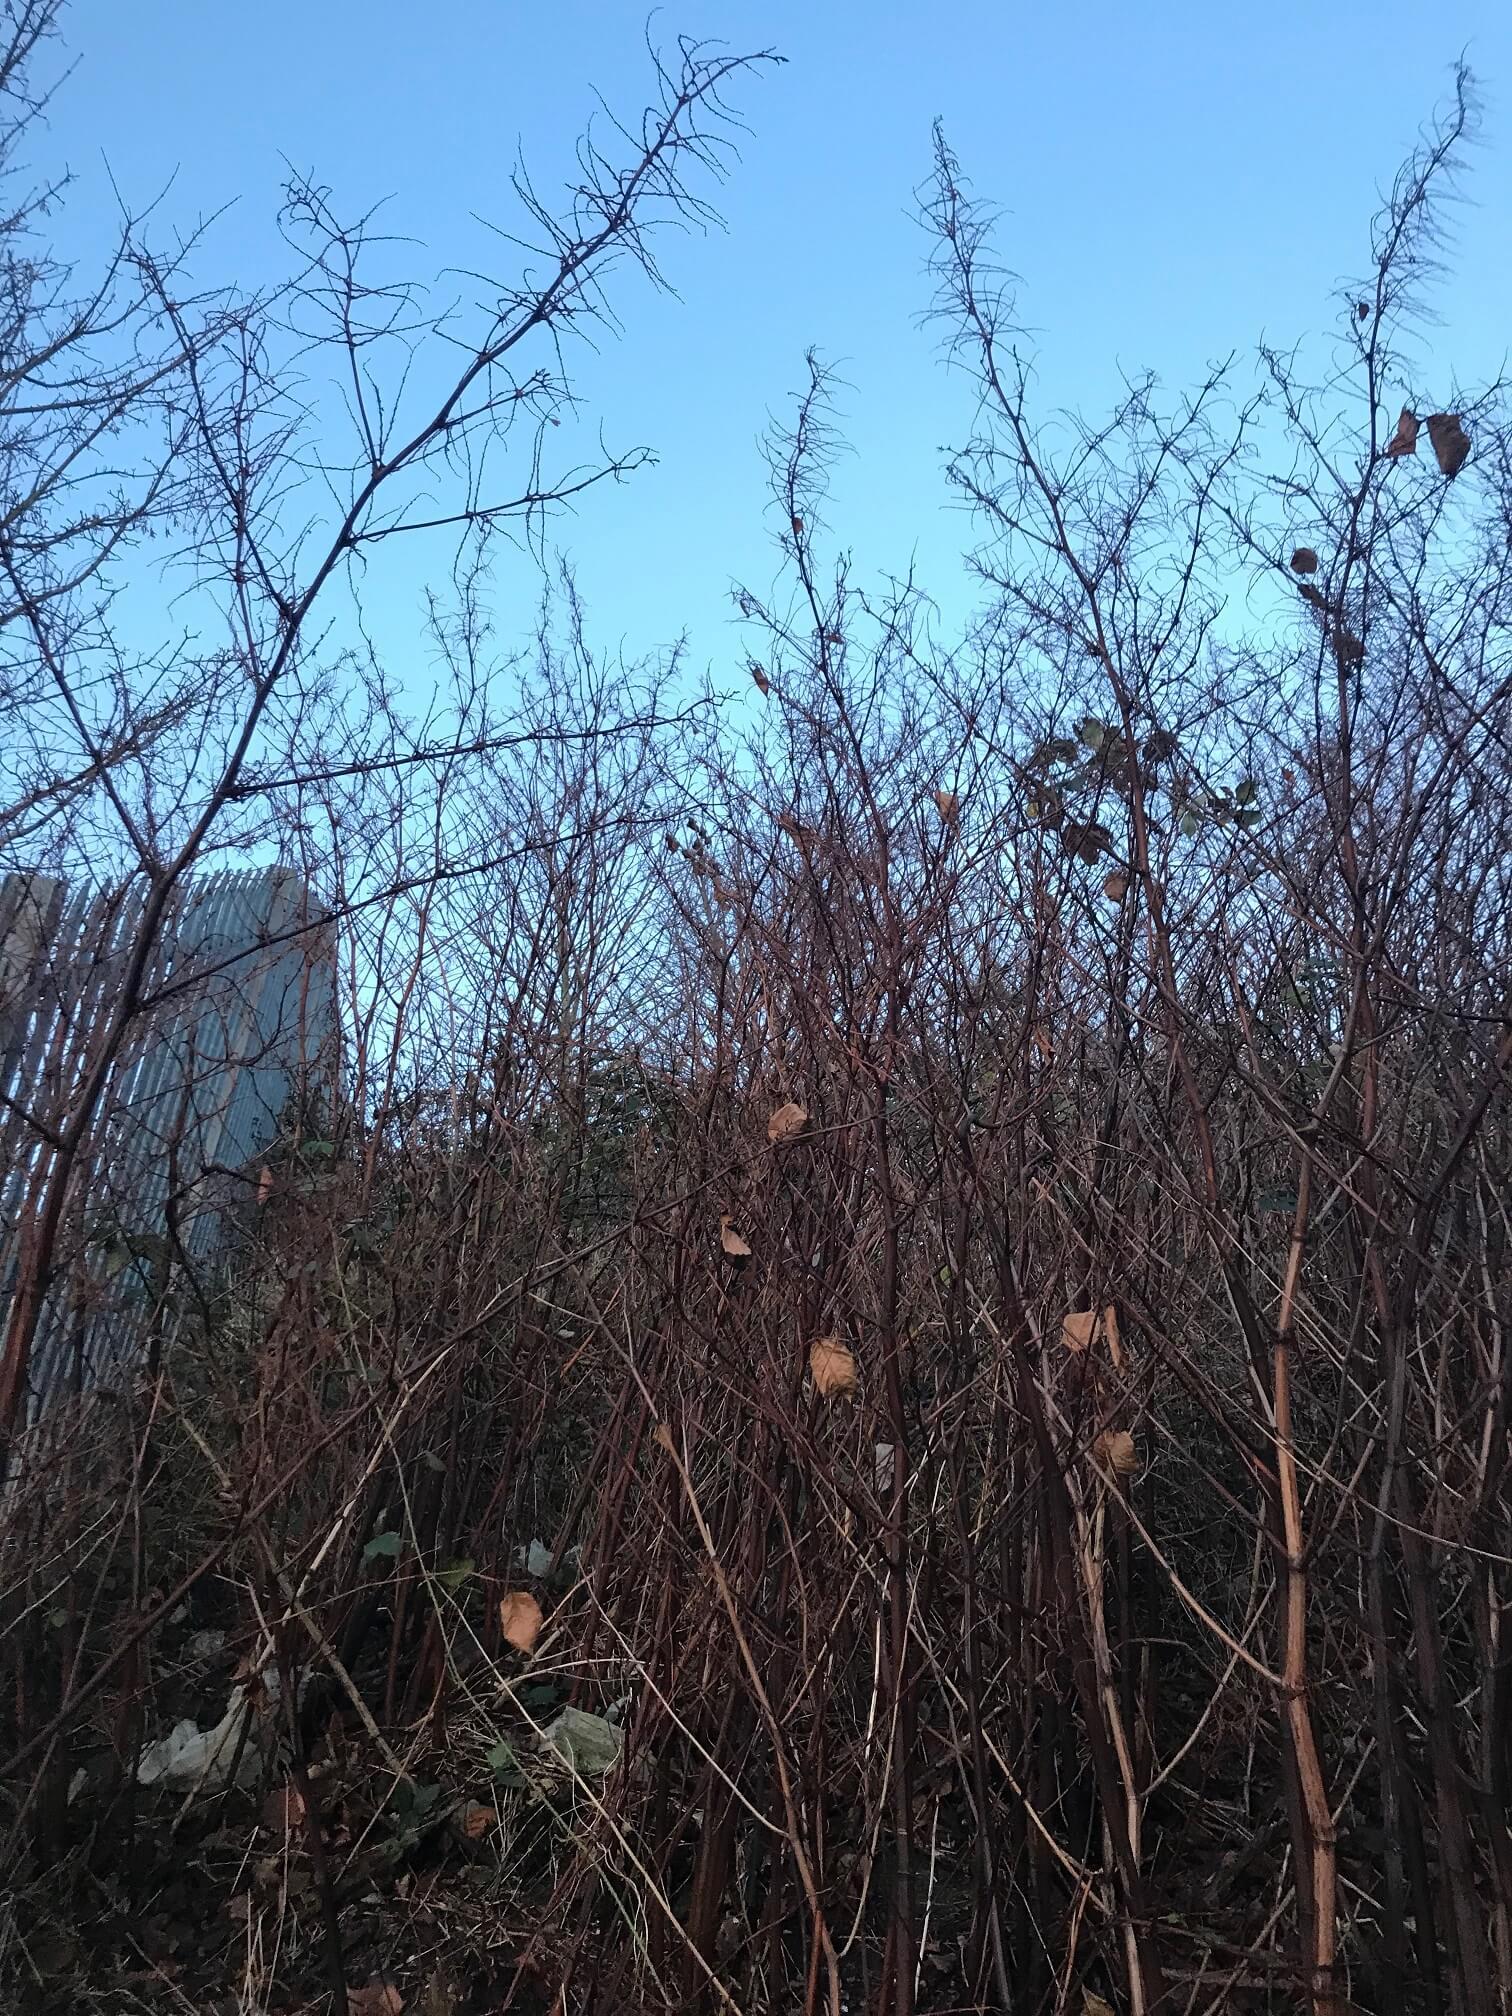 Identifying Japanese Knotweed - Stems with no foliage